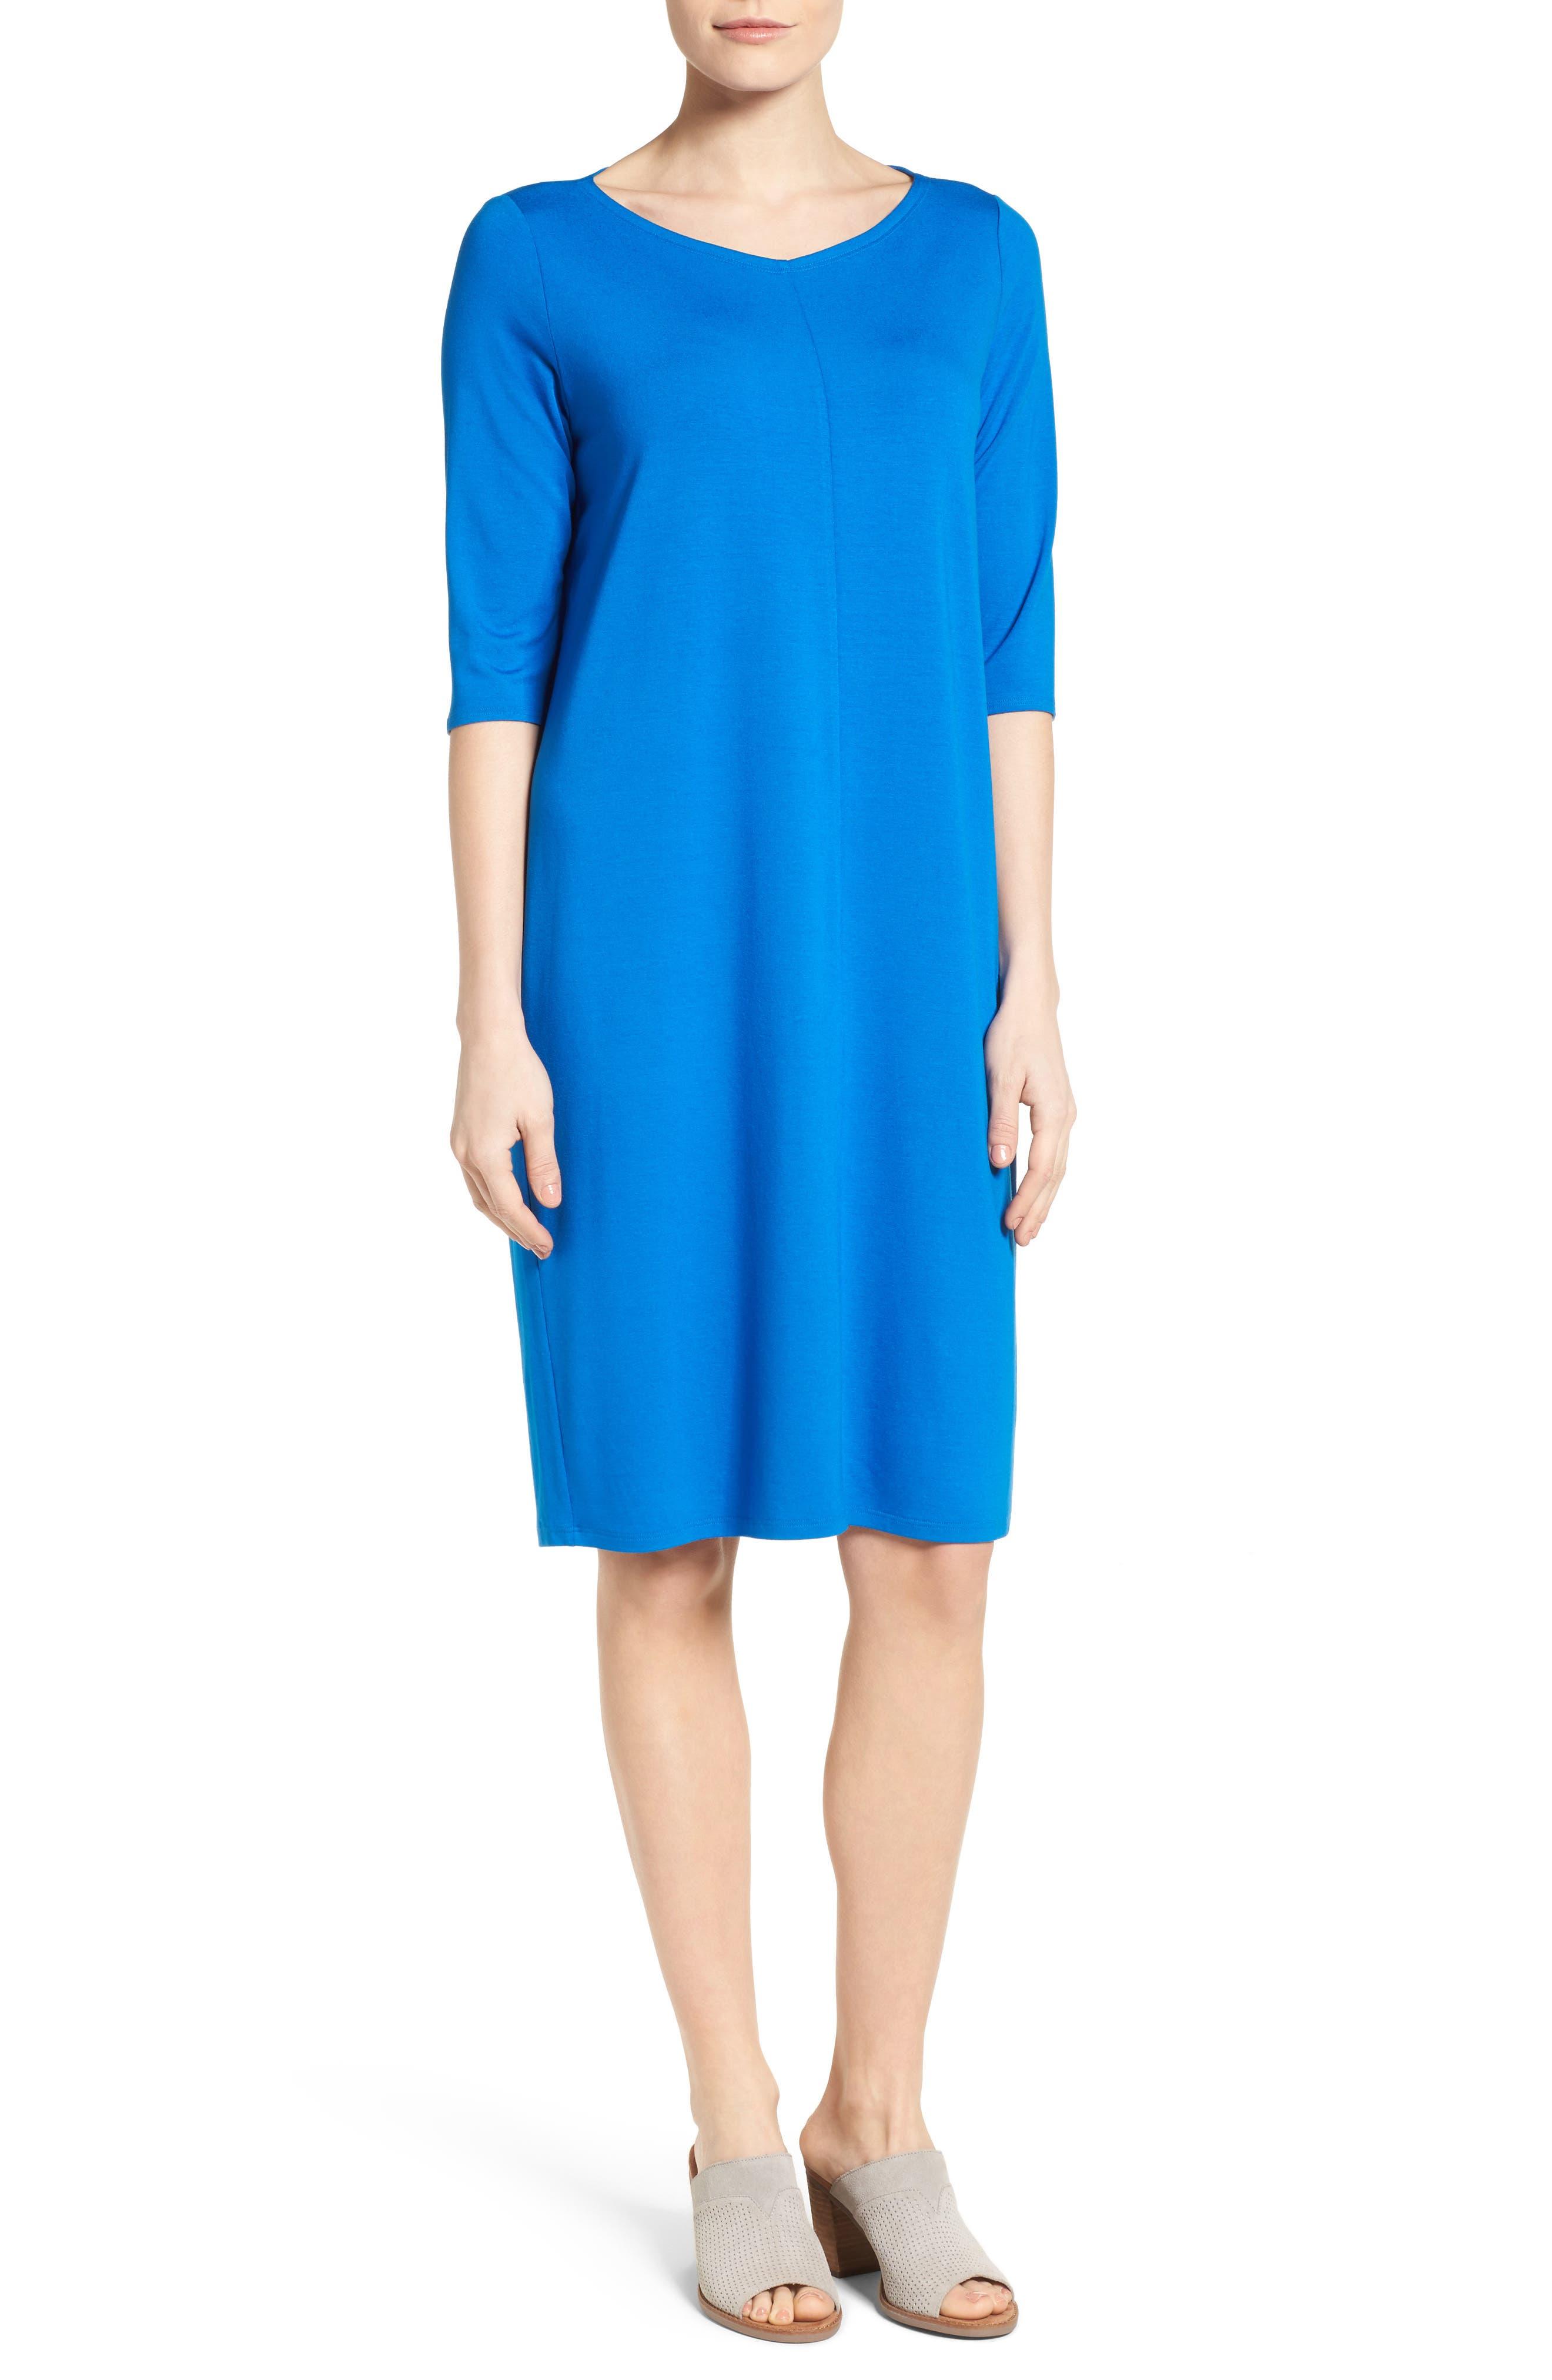 Alternate Image 1 Selected - Eileen Fisher V-Neck Jersey Shift Dress (Regular & Petite)